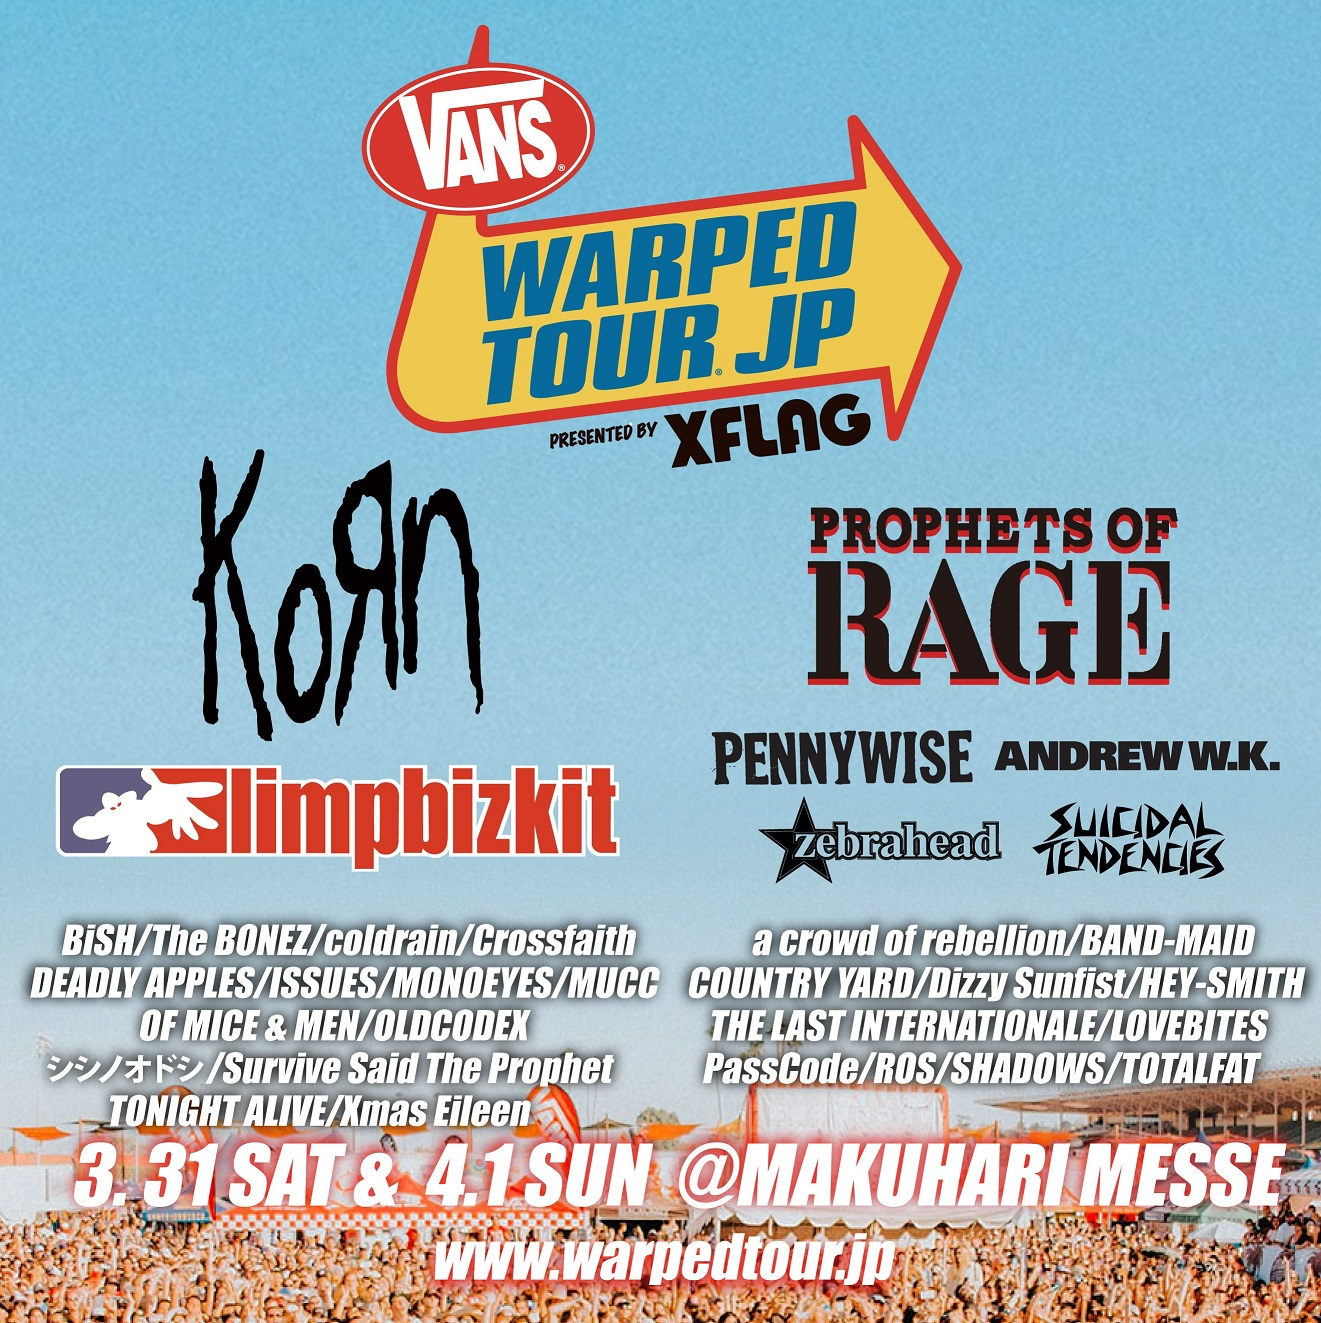 VANS WARPED TOUR JAPAN 2018 presented by XFLAG (ヴァンズワープドツアー ジャパン2018 )